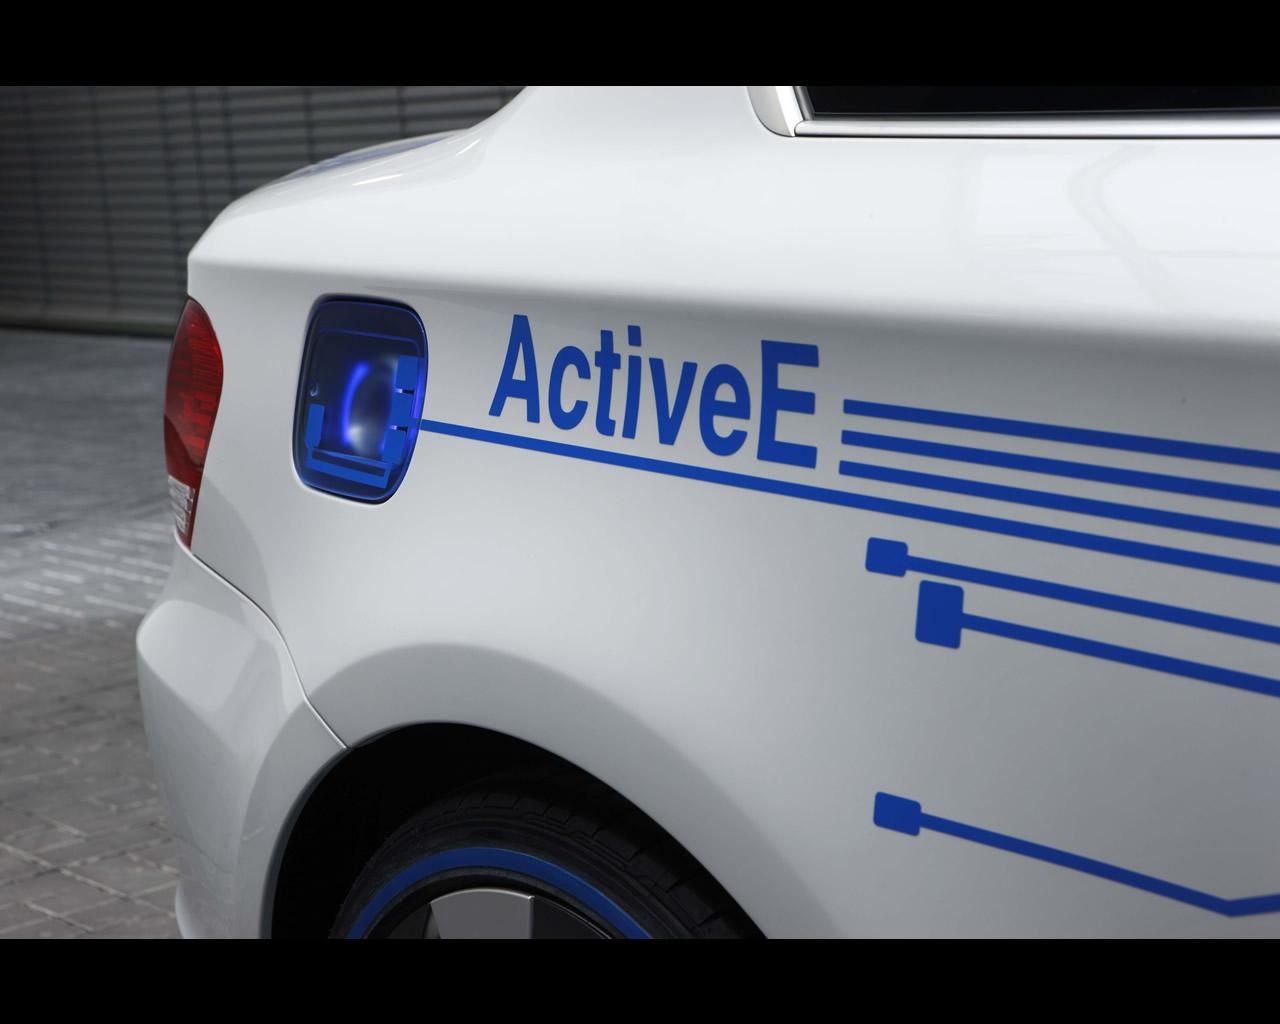 BMW 1 Series ActiveE Electric propulsion Concept 2010